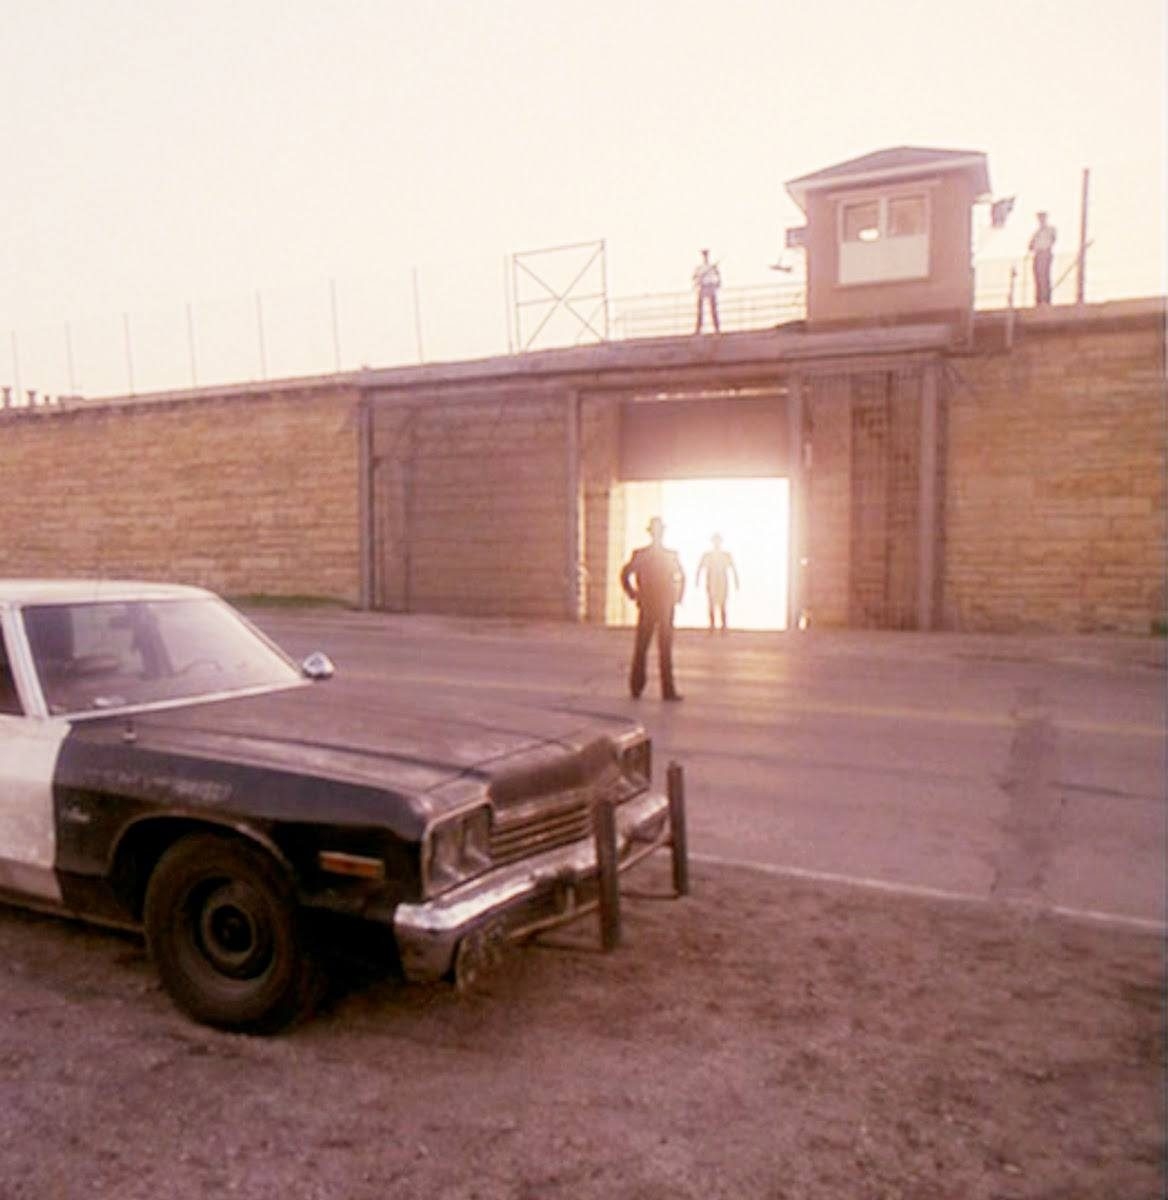 prison e1602491868878 20 Things You Never Knew About John Belushi